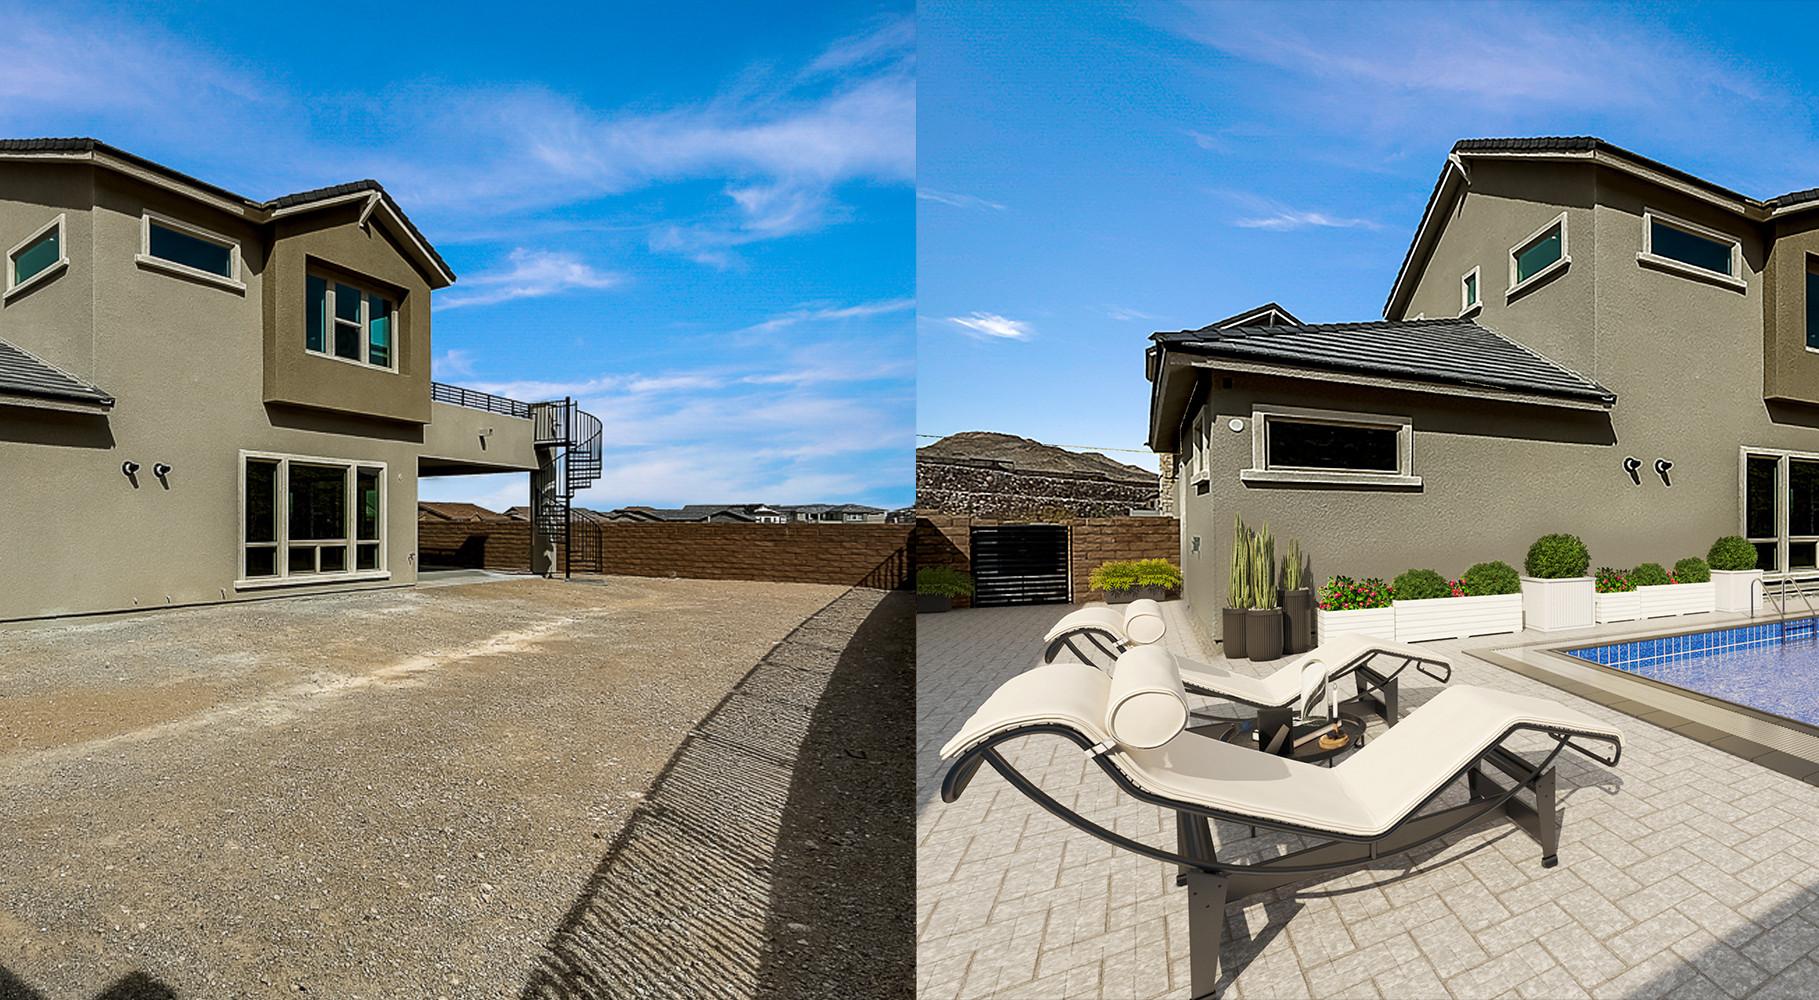 Before&After_pool_01.jpg